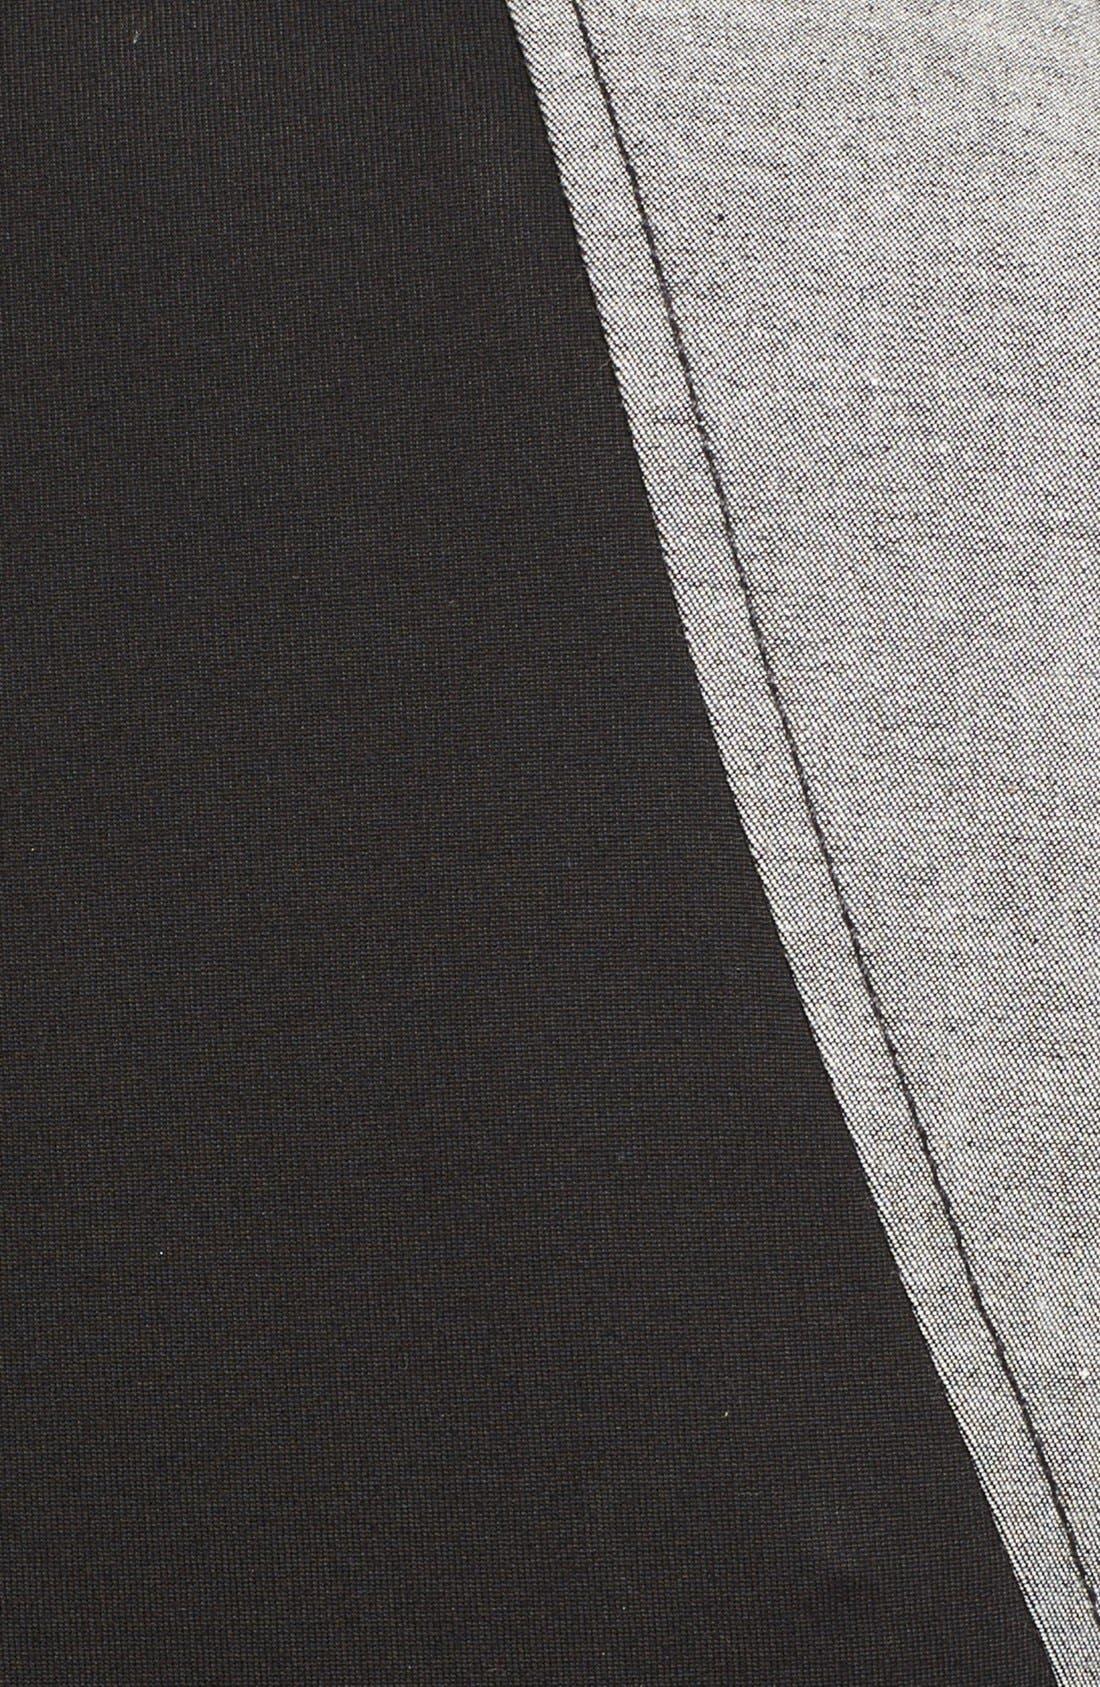 Alternate Image 3  - Donna Karan New York Stretch Denim & Jersey Dress